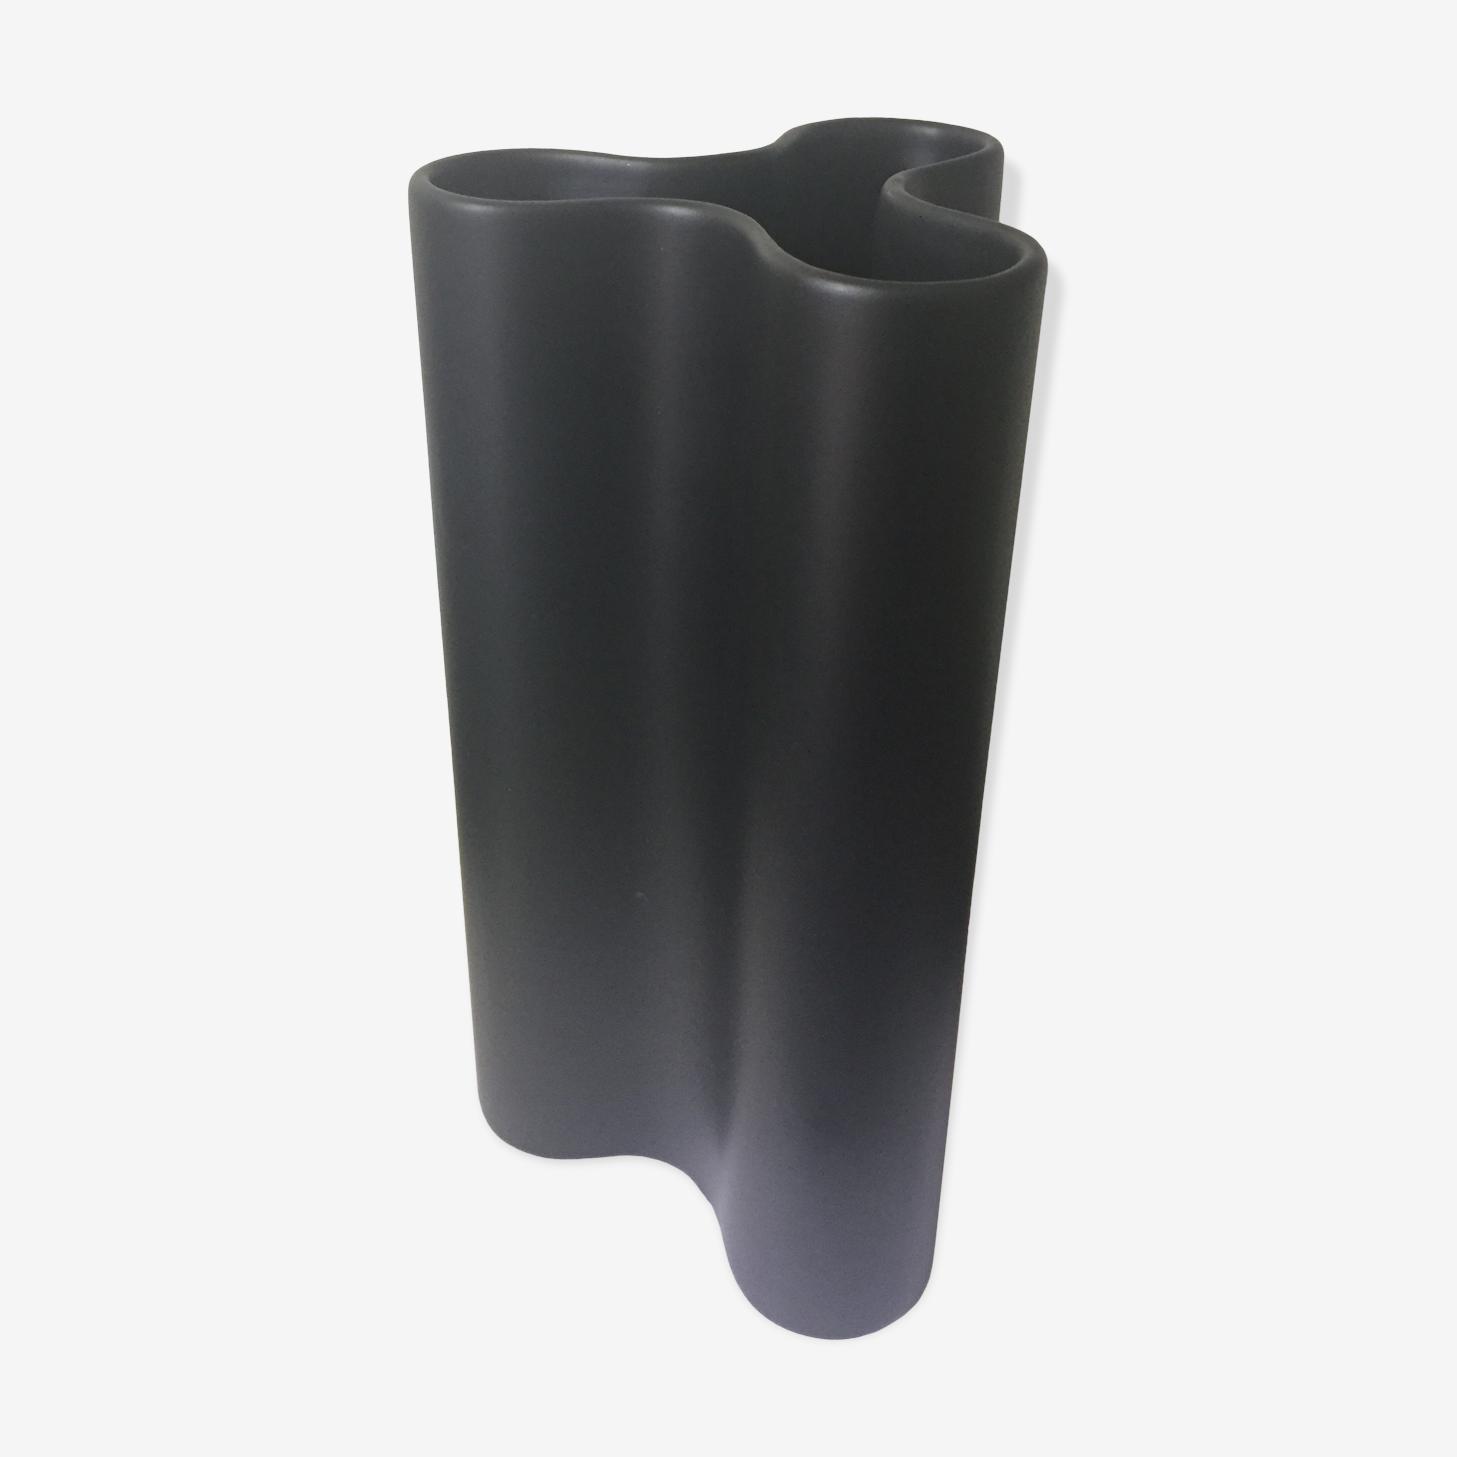 Vase ceramic Asa 1970